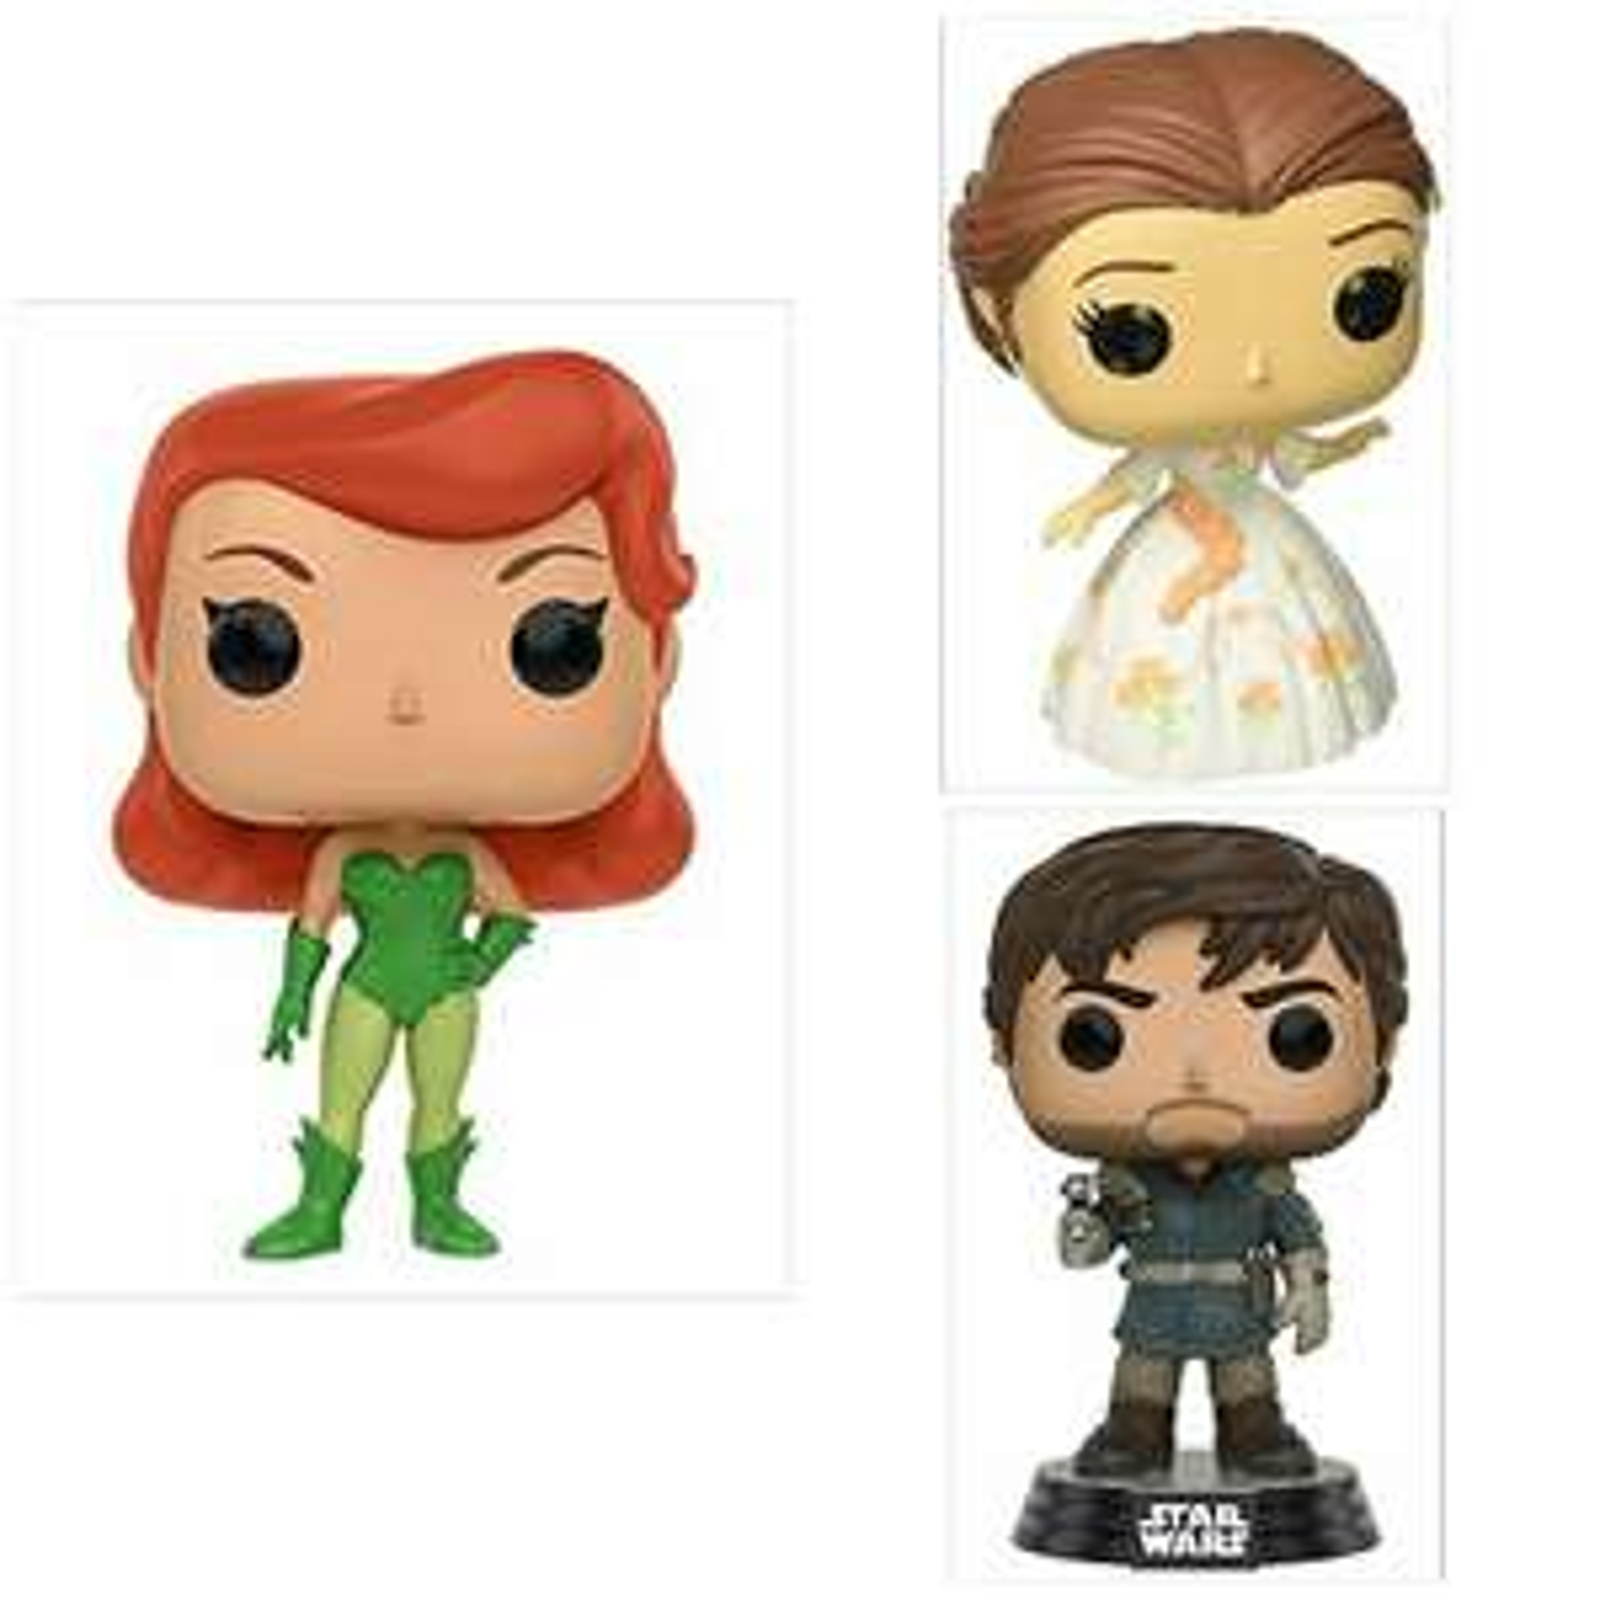 Amazon: Funko Pop Poison Ivy, Bella, Capitán Cassian (Diego Luna, SW Rougue One) Envío Prime. $99 c/u